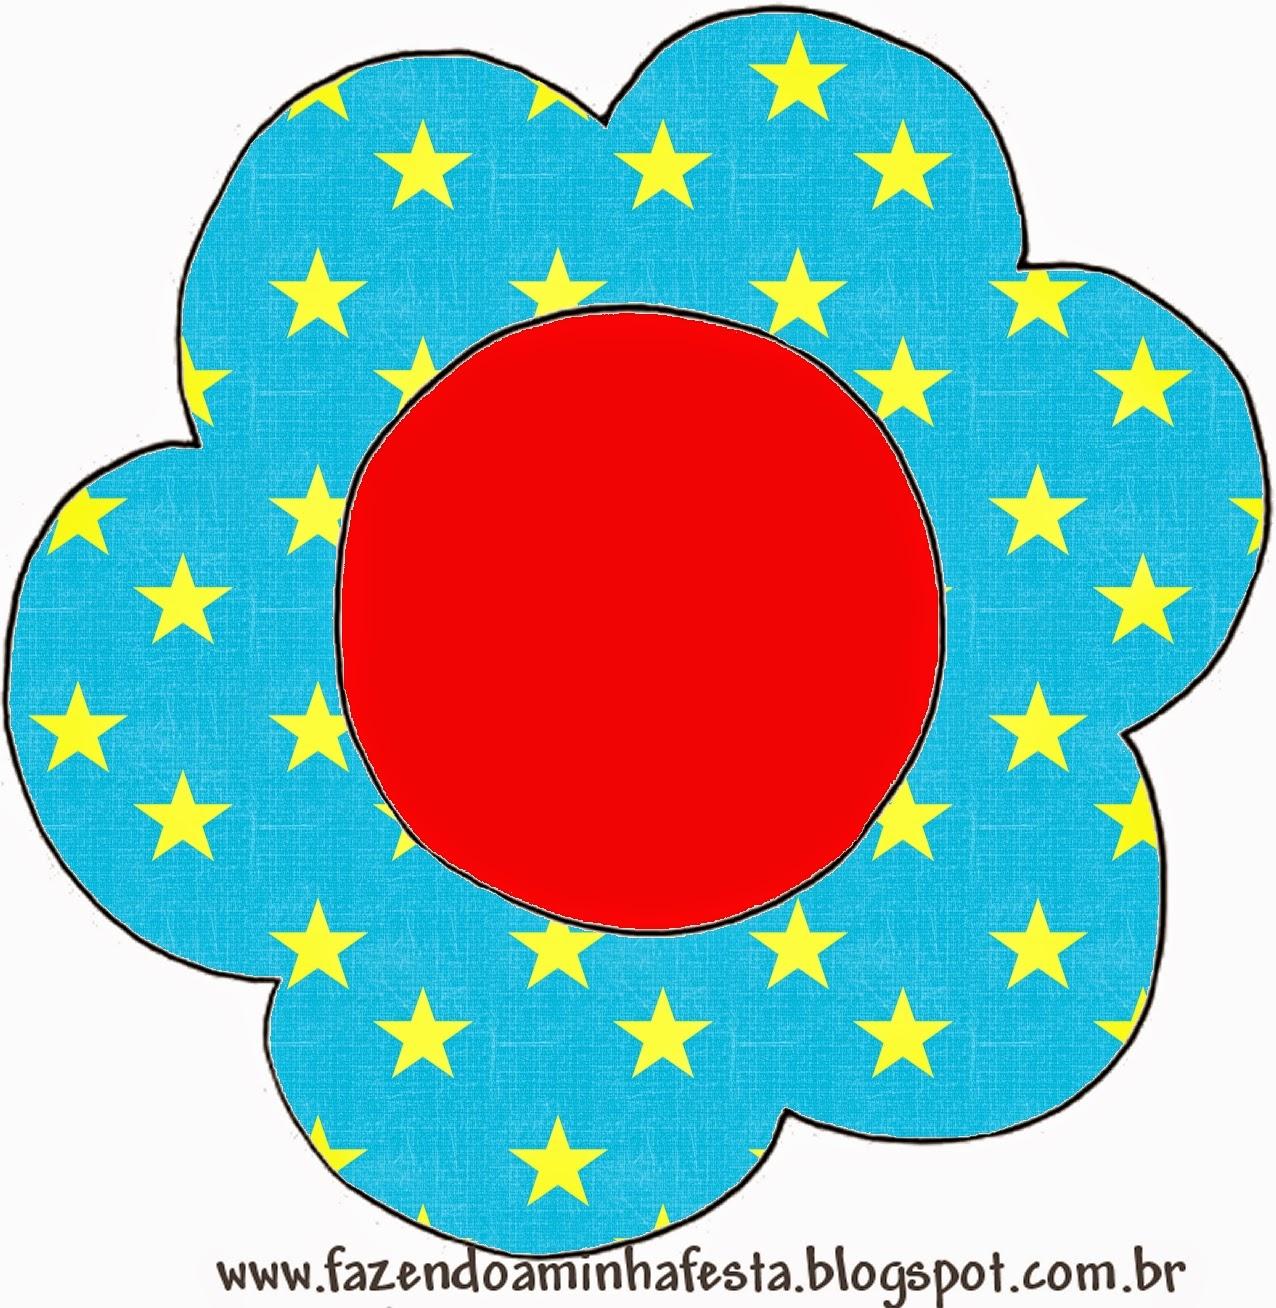 Tarjeta con forma de flor de Estrellas sobre Fondo Celeste.